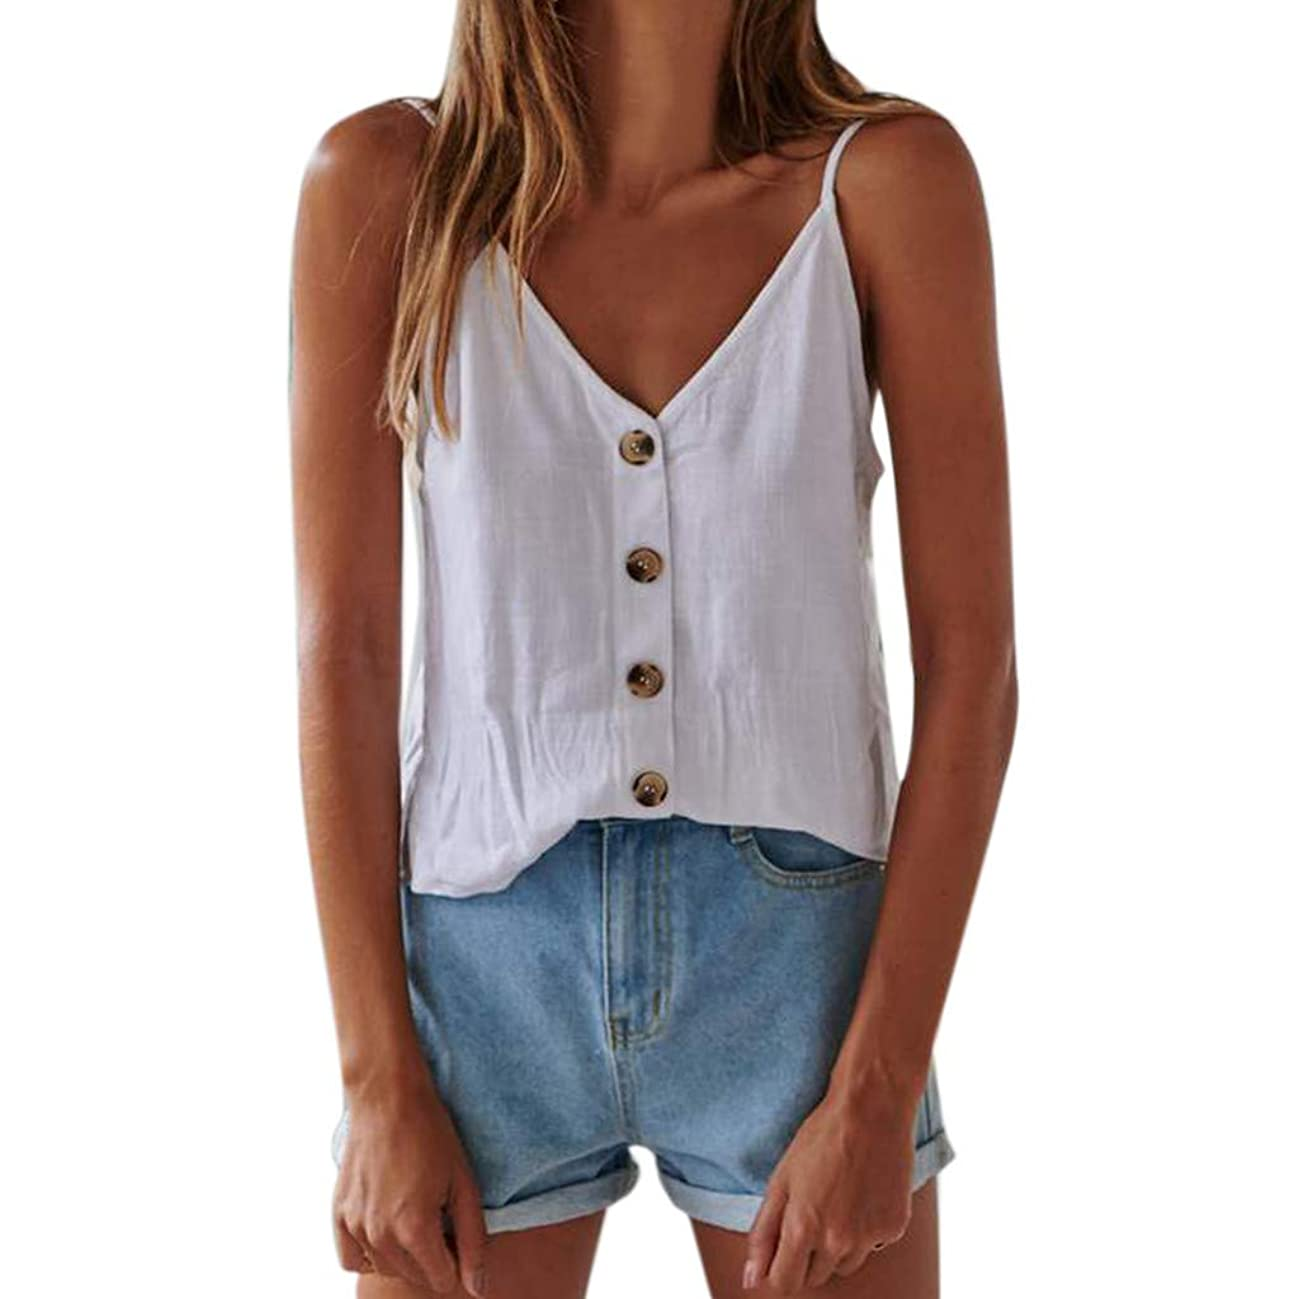 Tronet Summer Casual Women Button Sleeveless Solid Top Vest Tank Shirt Blouse Tops